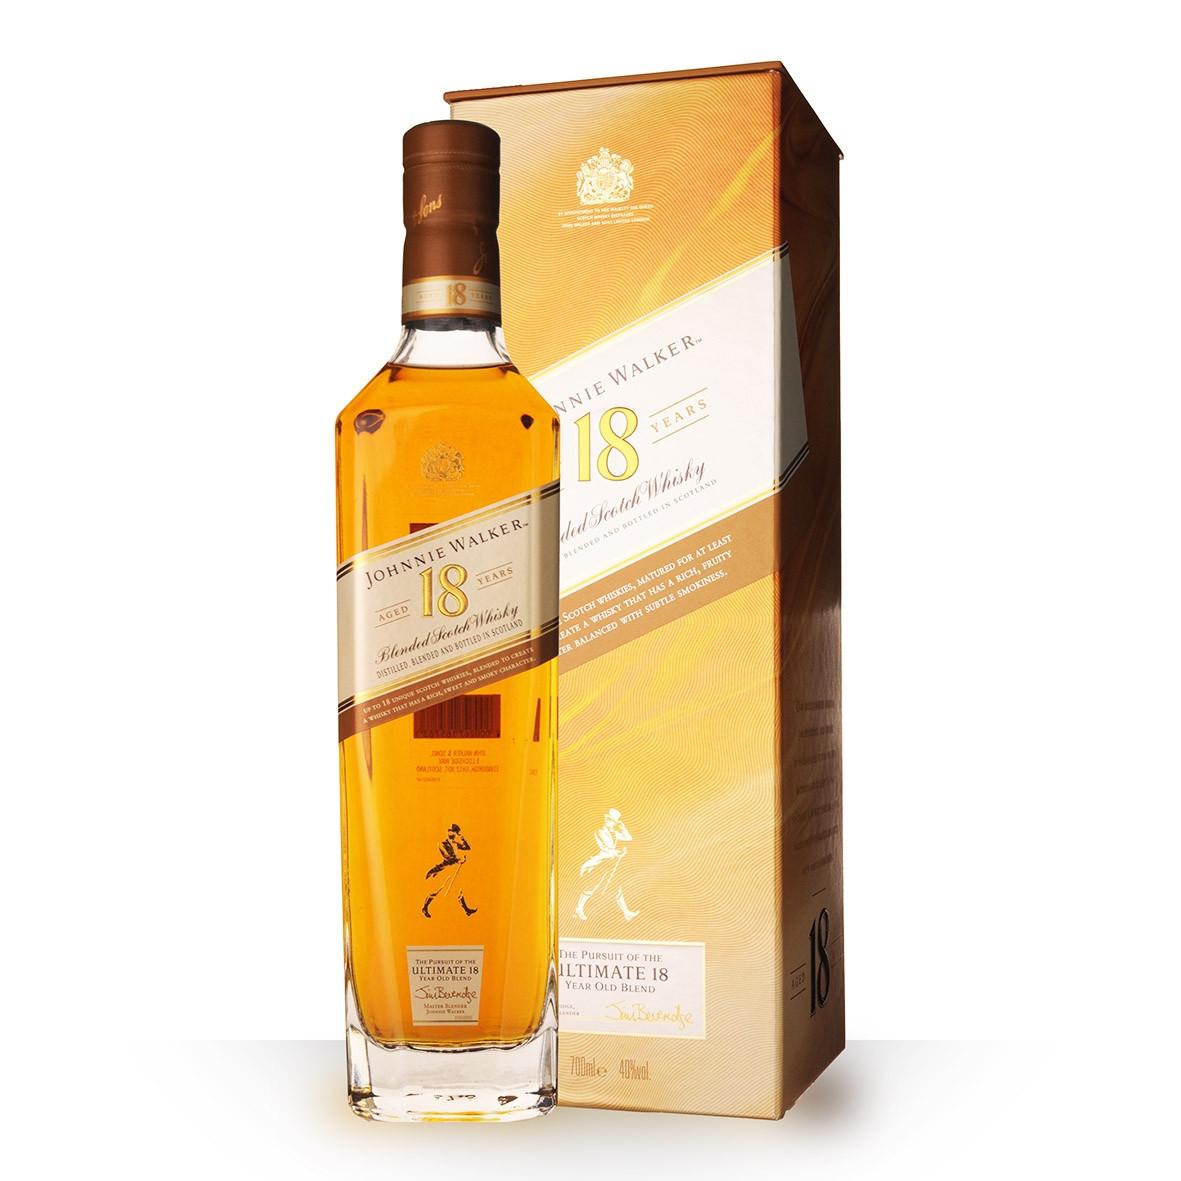 Whisky Johnnie Walker Platinium Label 18 ans 70cl Etui www.odyssee-vins.com